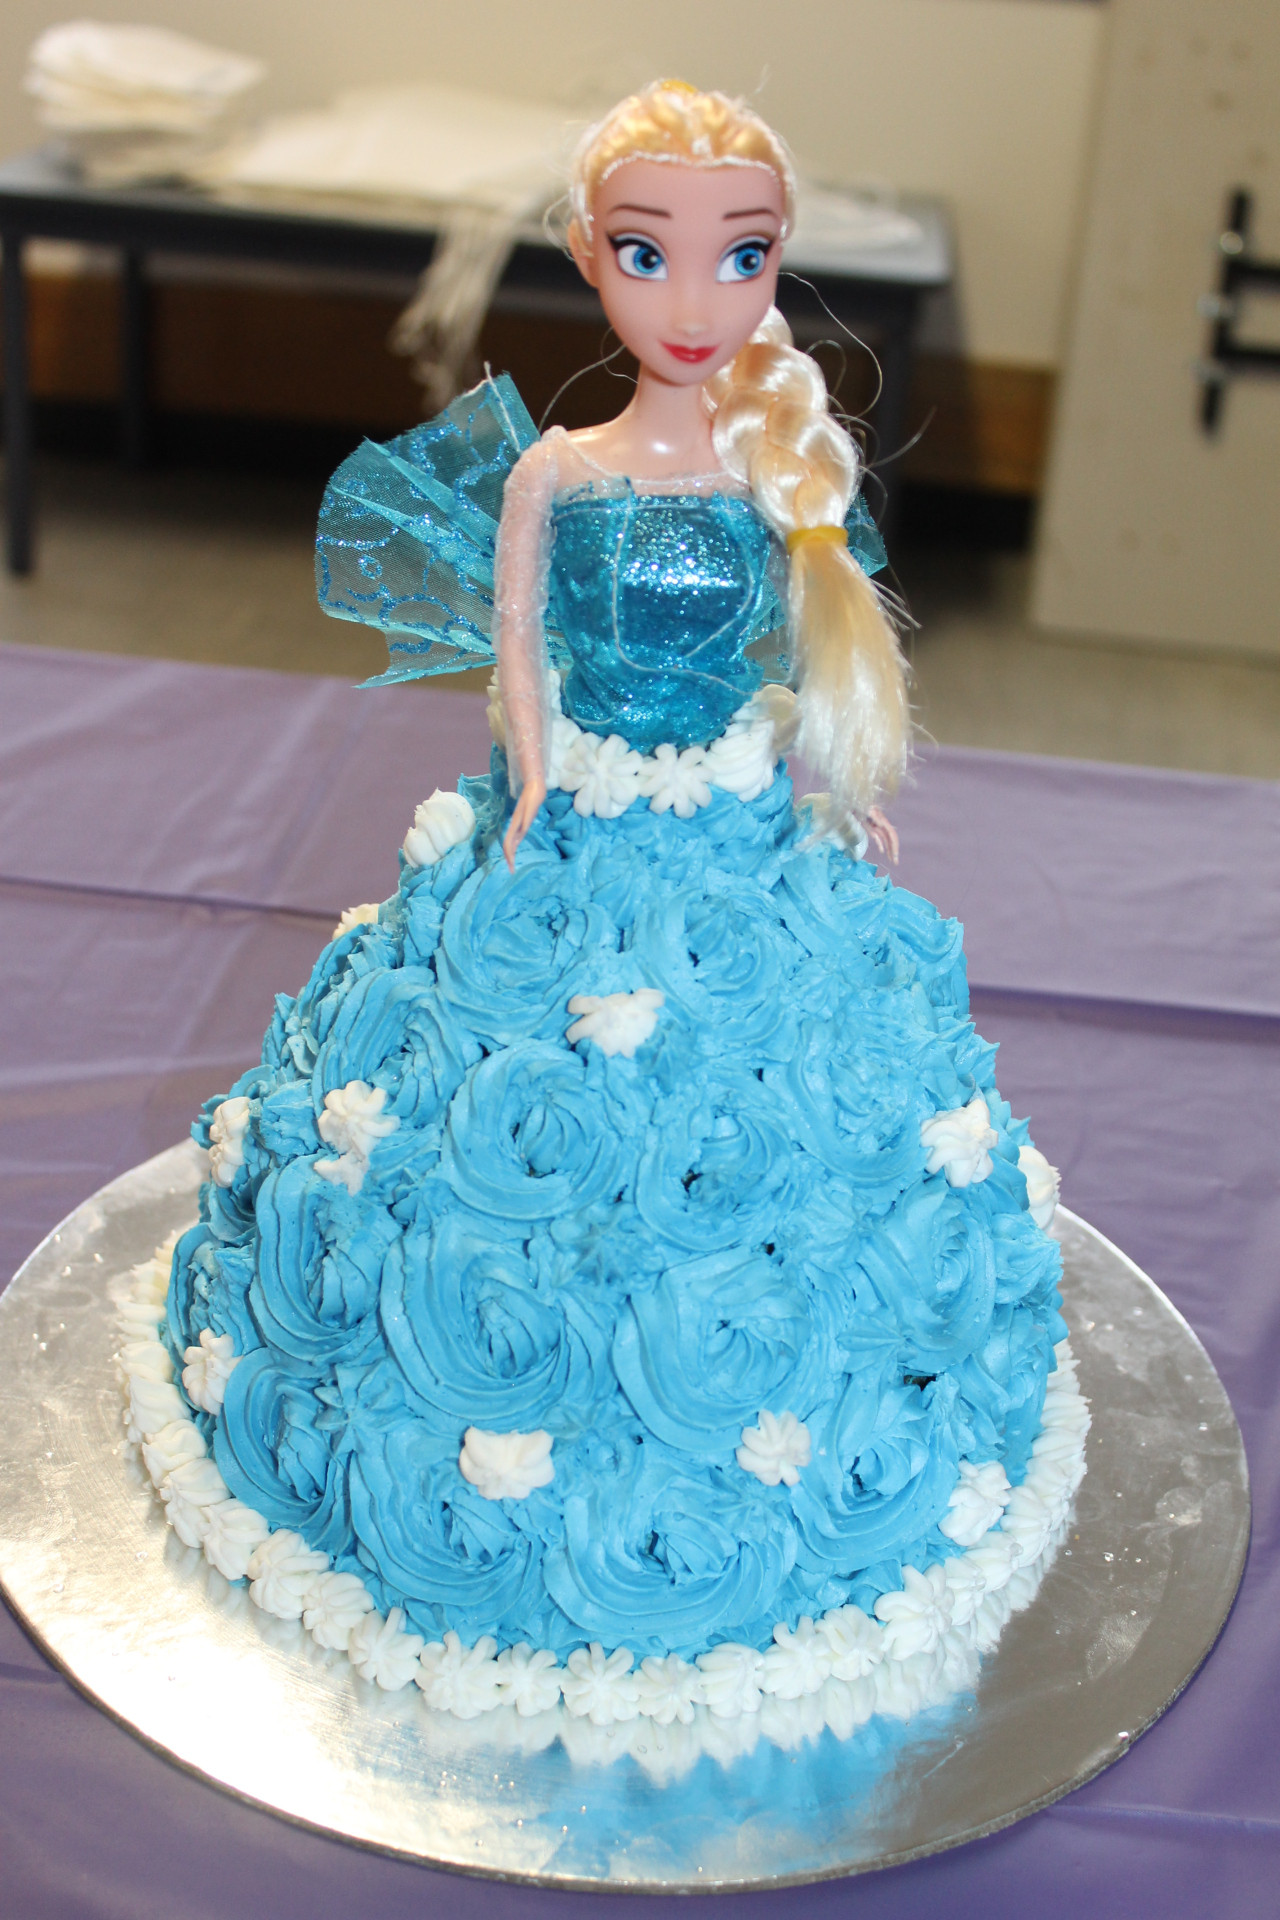 Frozen Birthday Cake Ideas  Frozen Cake – Elsa & Anna